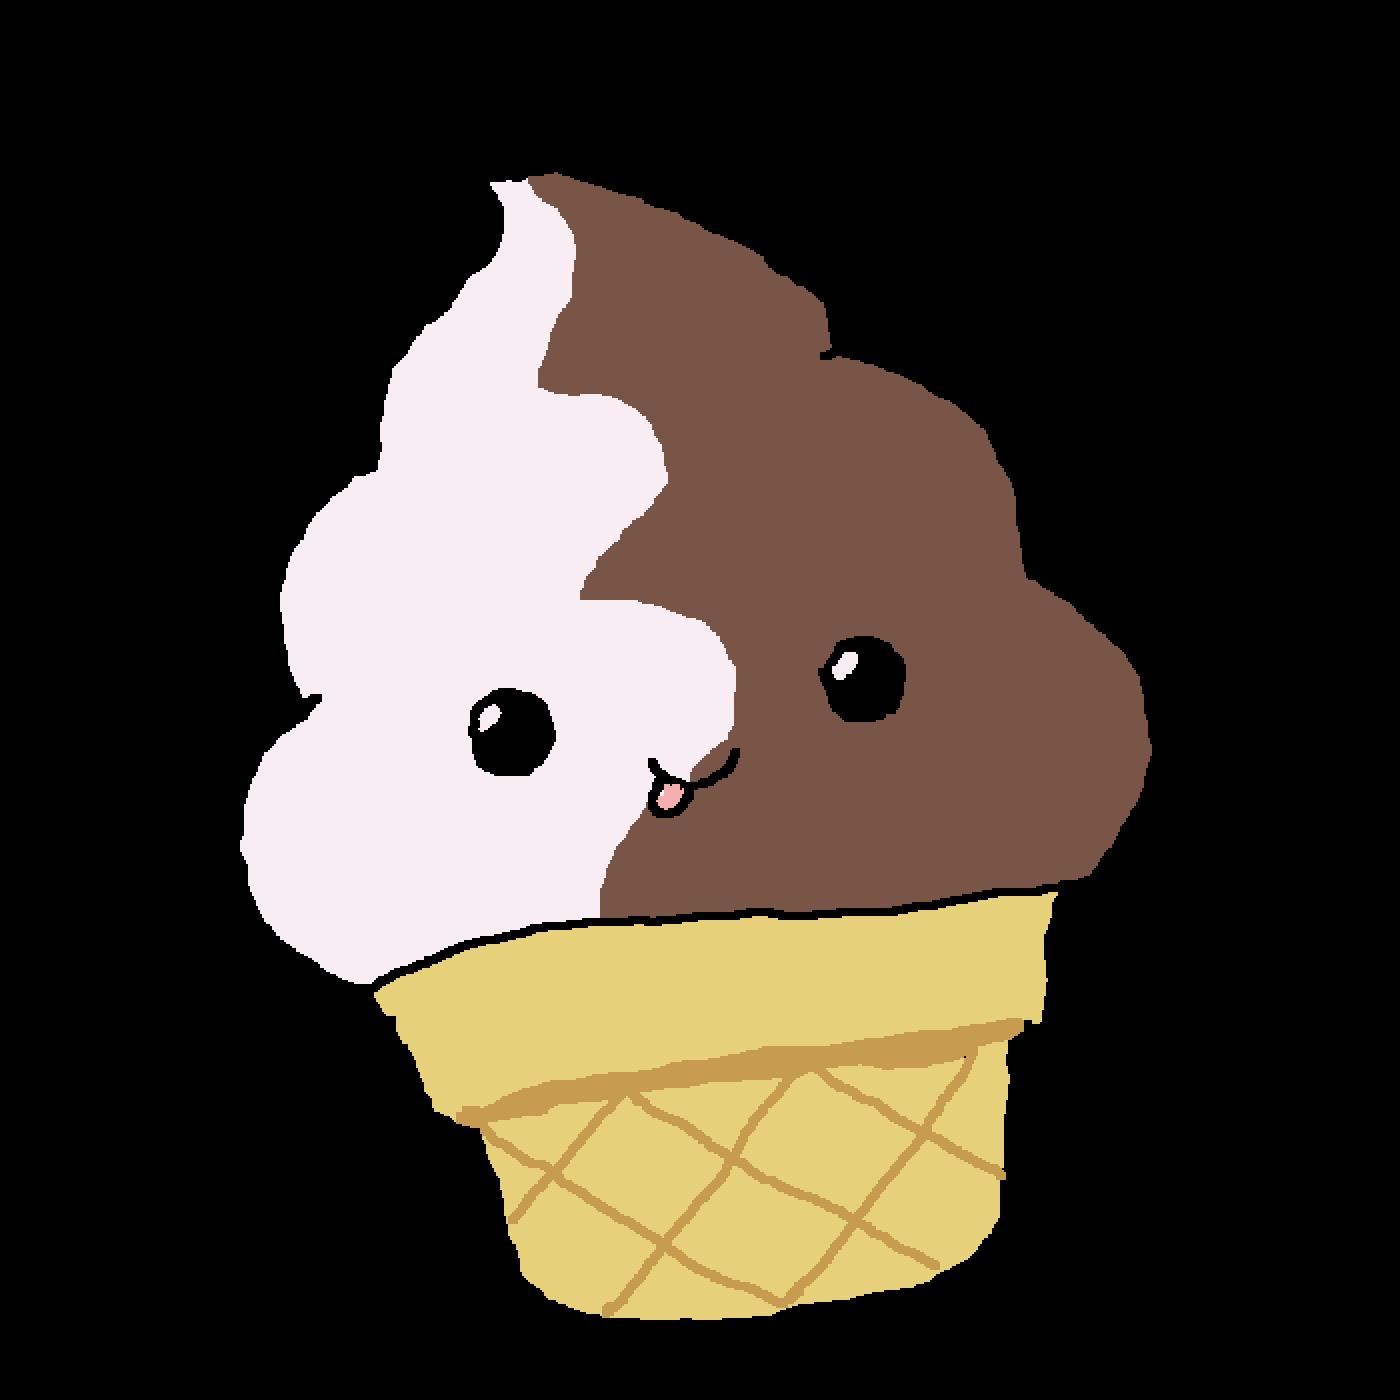 Icecream clipart kawaii. Pixilart happy ice cream